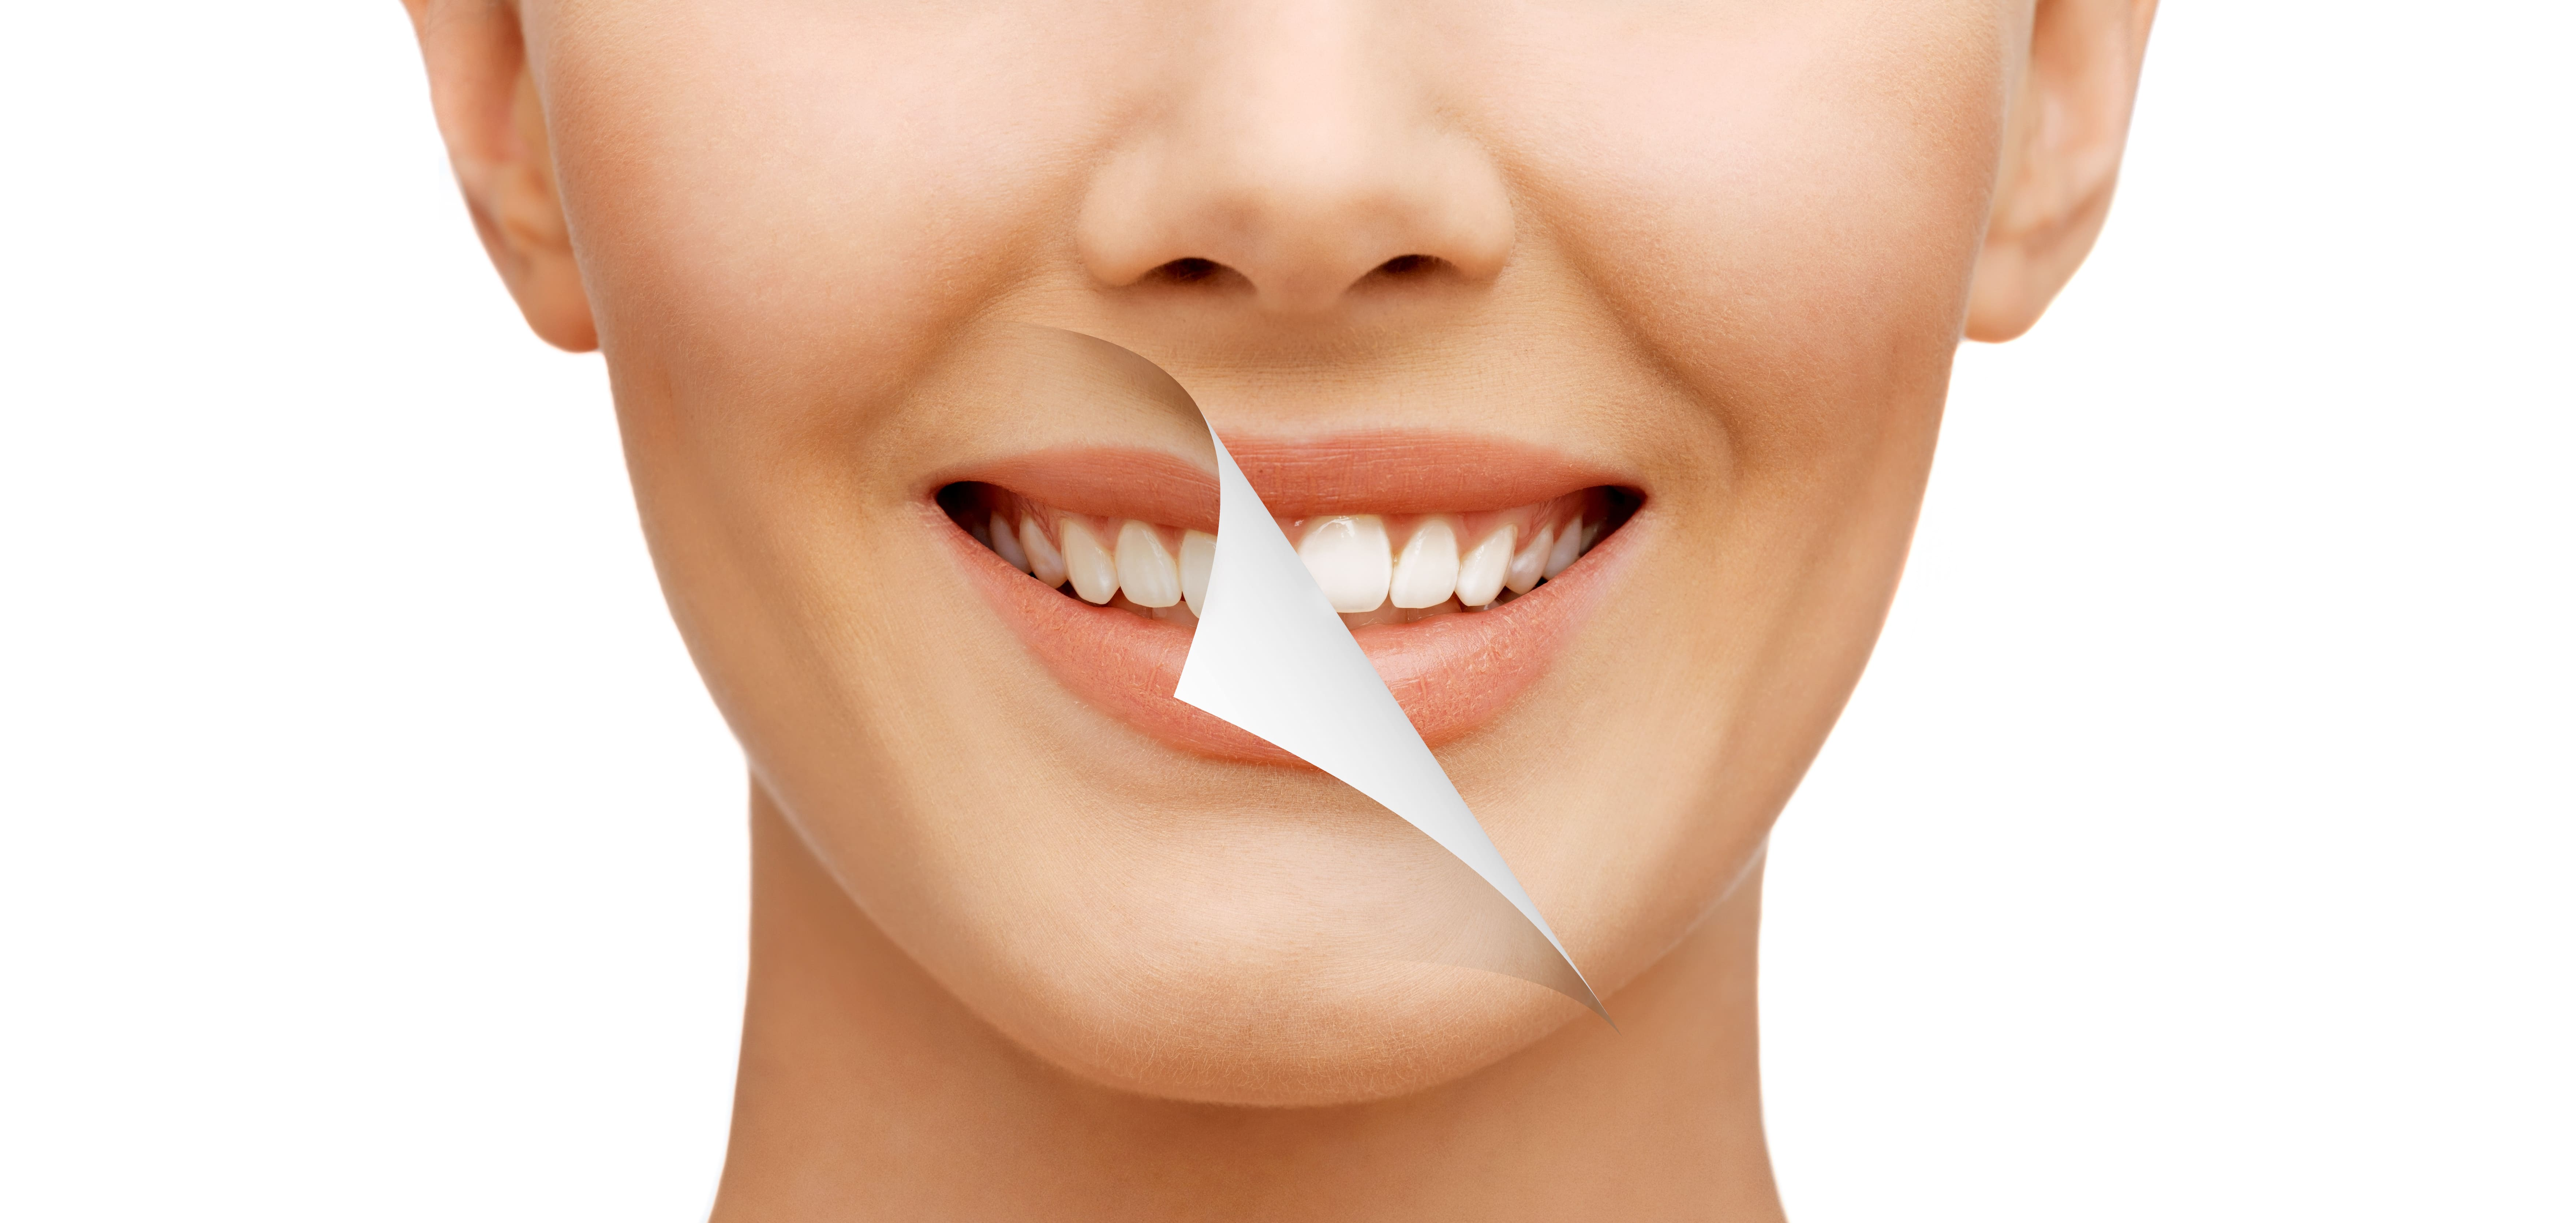 Teeth Whitening FAQ's